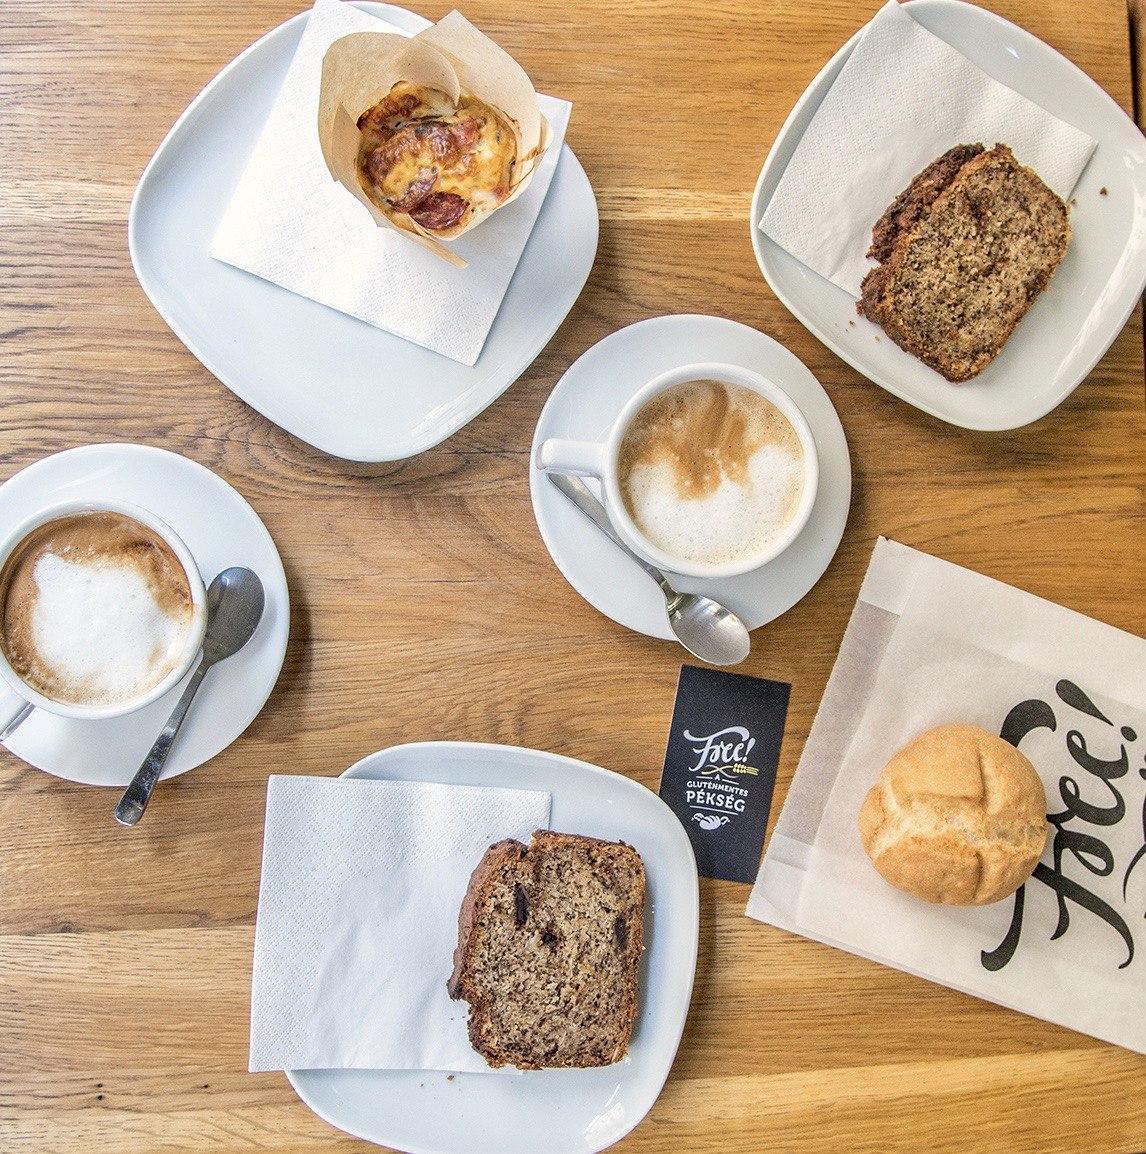 100% glutenfrei Budapest - Free Bakery